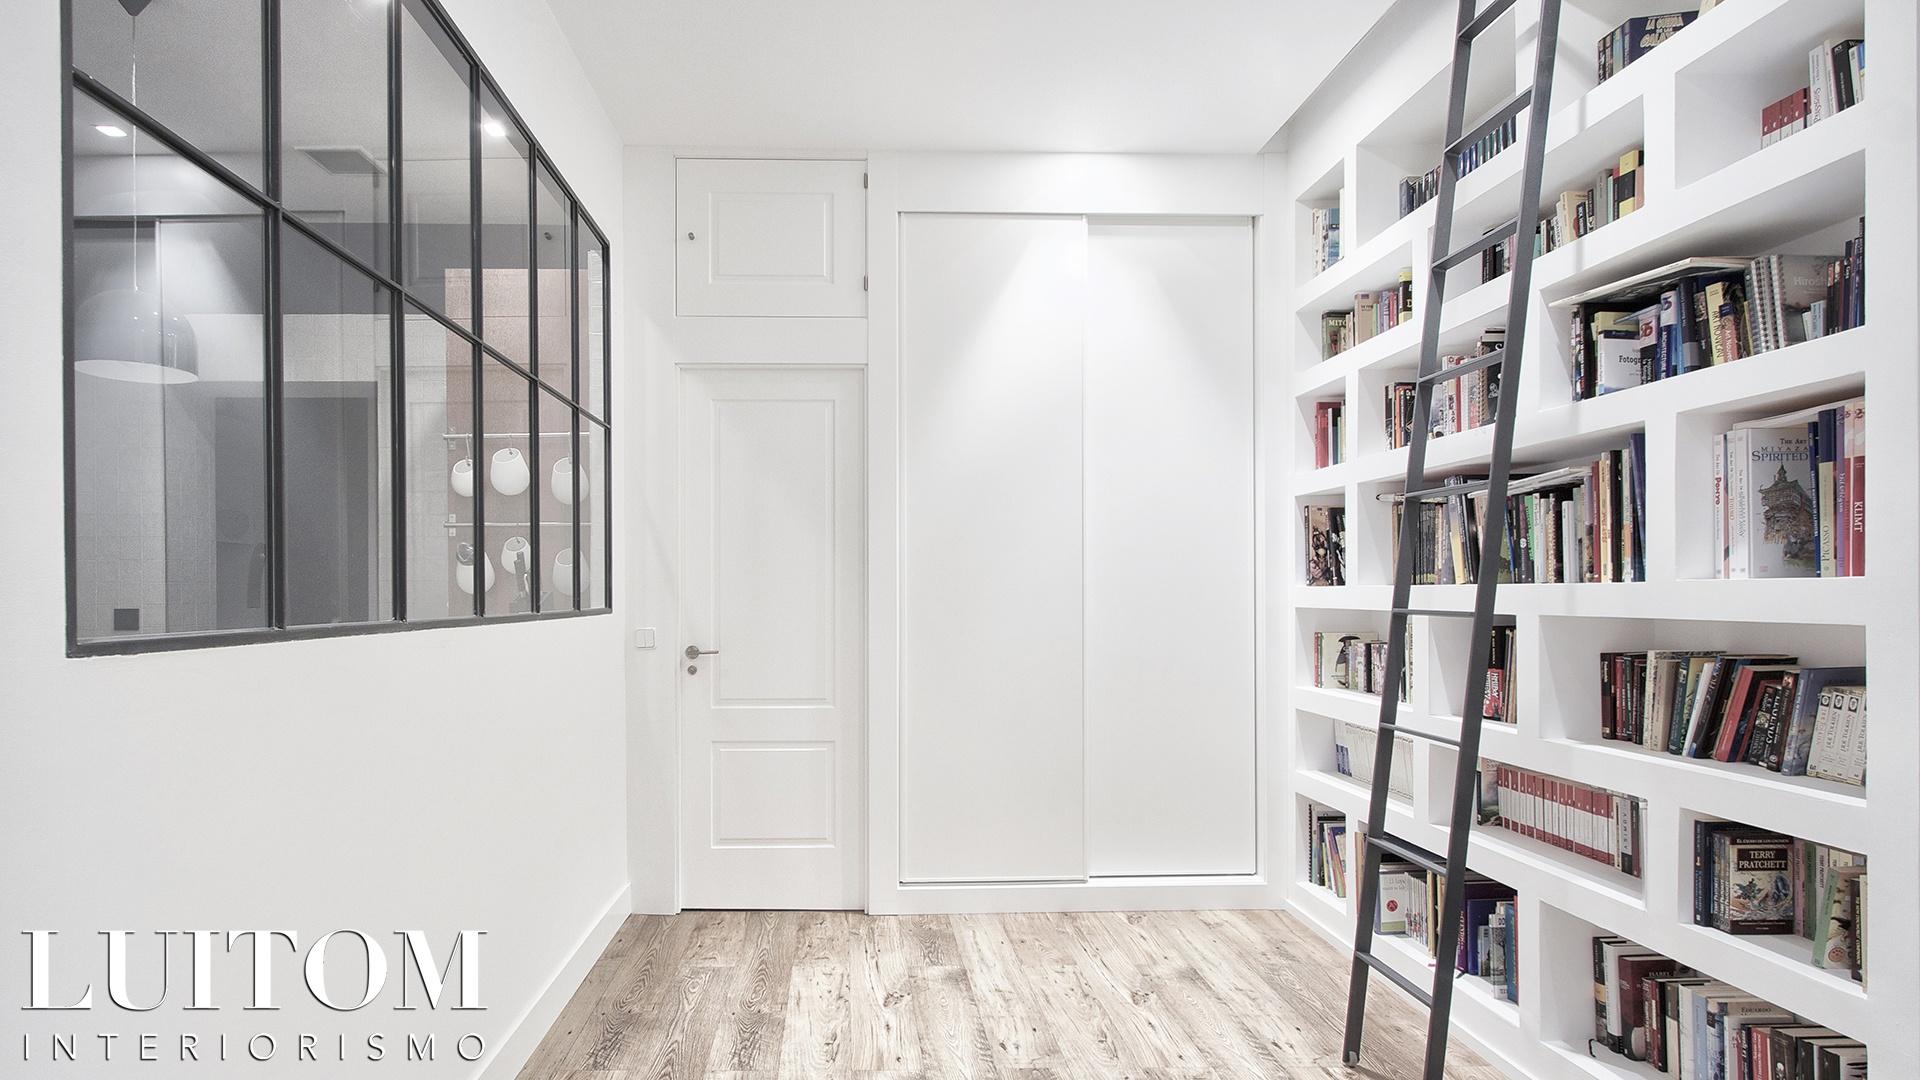 cristaleras-cocinas-pared-cristal-separacion-cocina-salon-cristalera-metalica-madera-blanca-negra-21